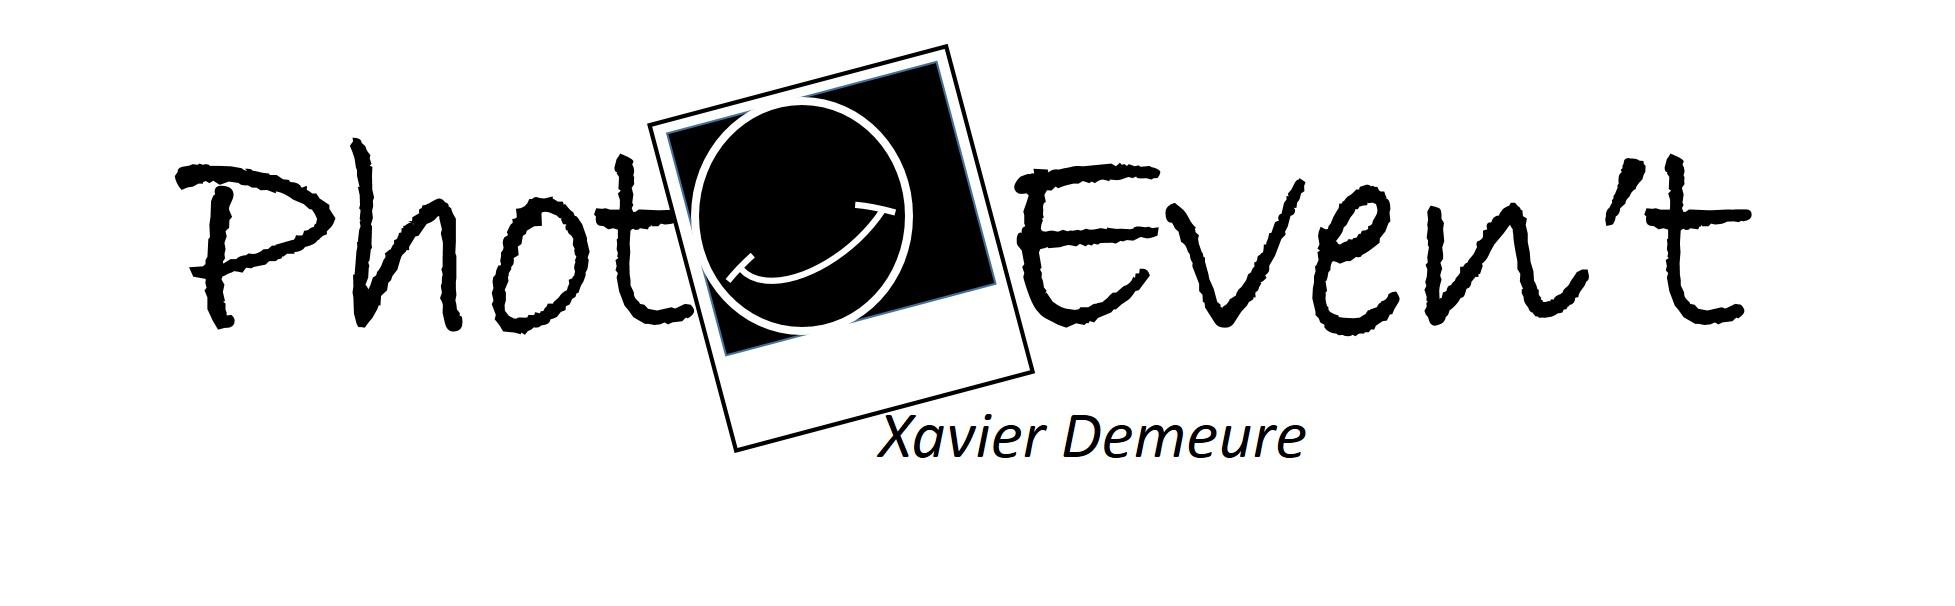 Photo_event_logo_n